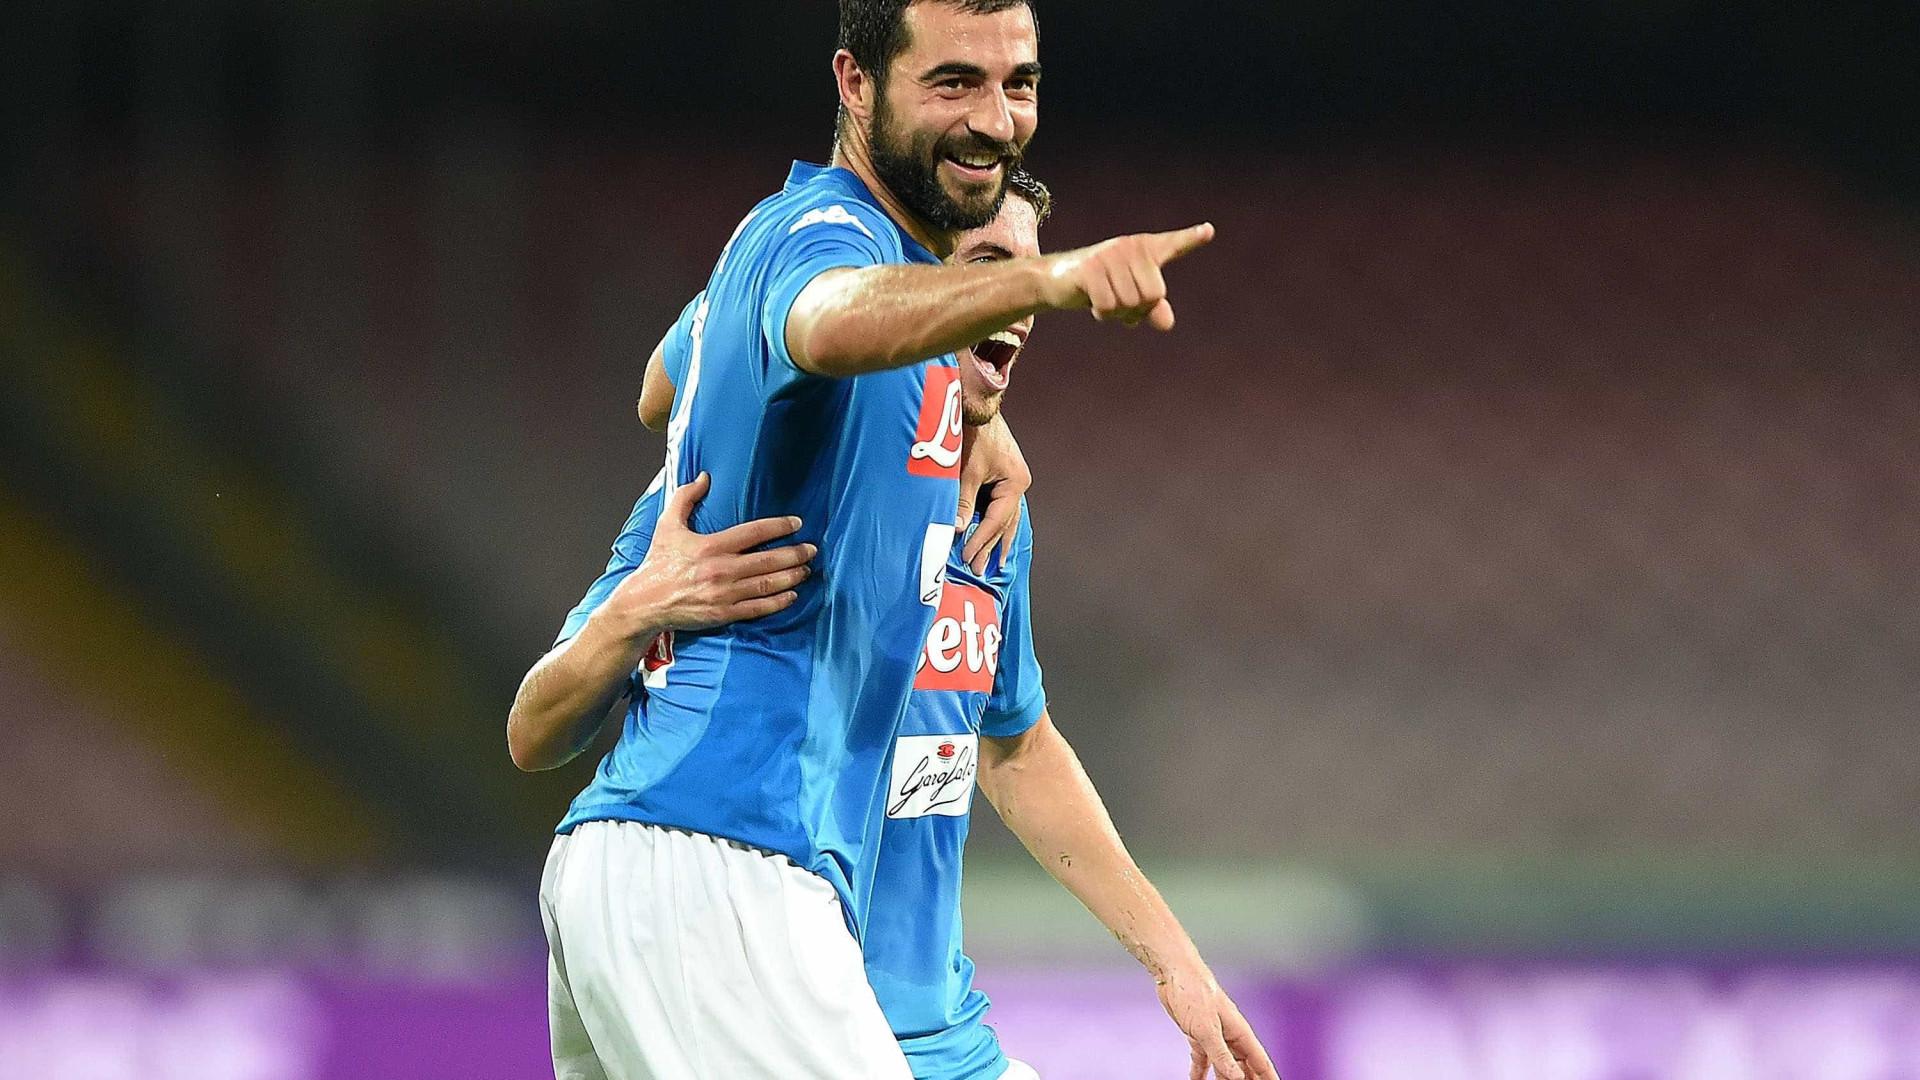 Sarri projeta Napoli 'corajoso' para bater Manchester City na Liga dos Campeões